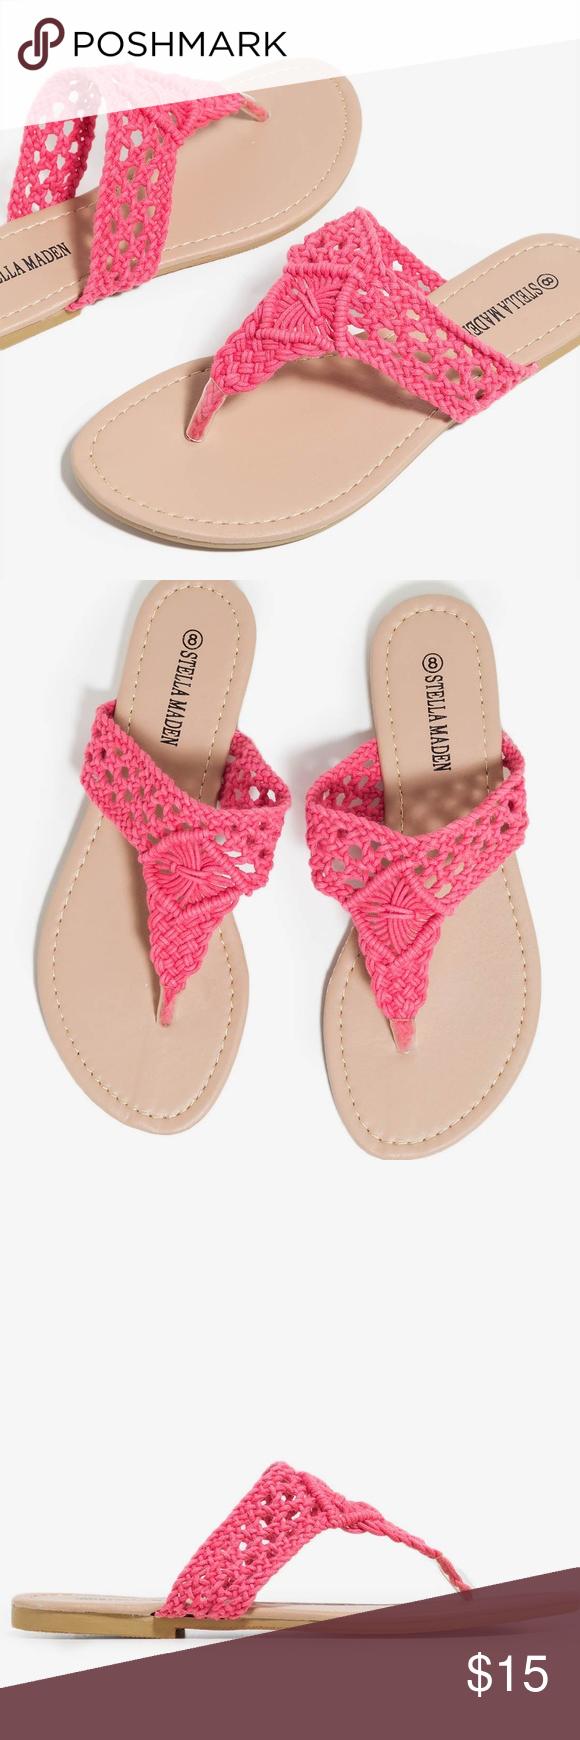 3a31973f0a2 NEW Coral Crochet Vamp Design Thong Strap Sandals NEW Stella Maden Women s  Coral Crochet Vamp Design